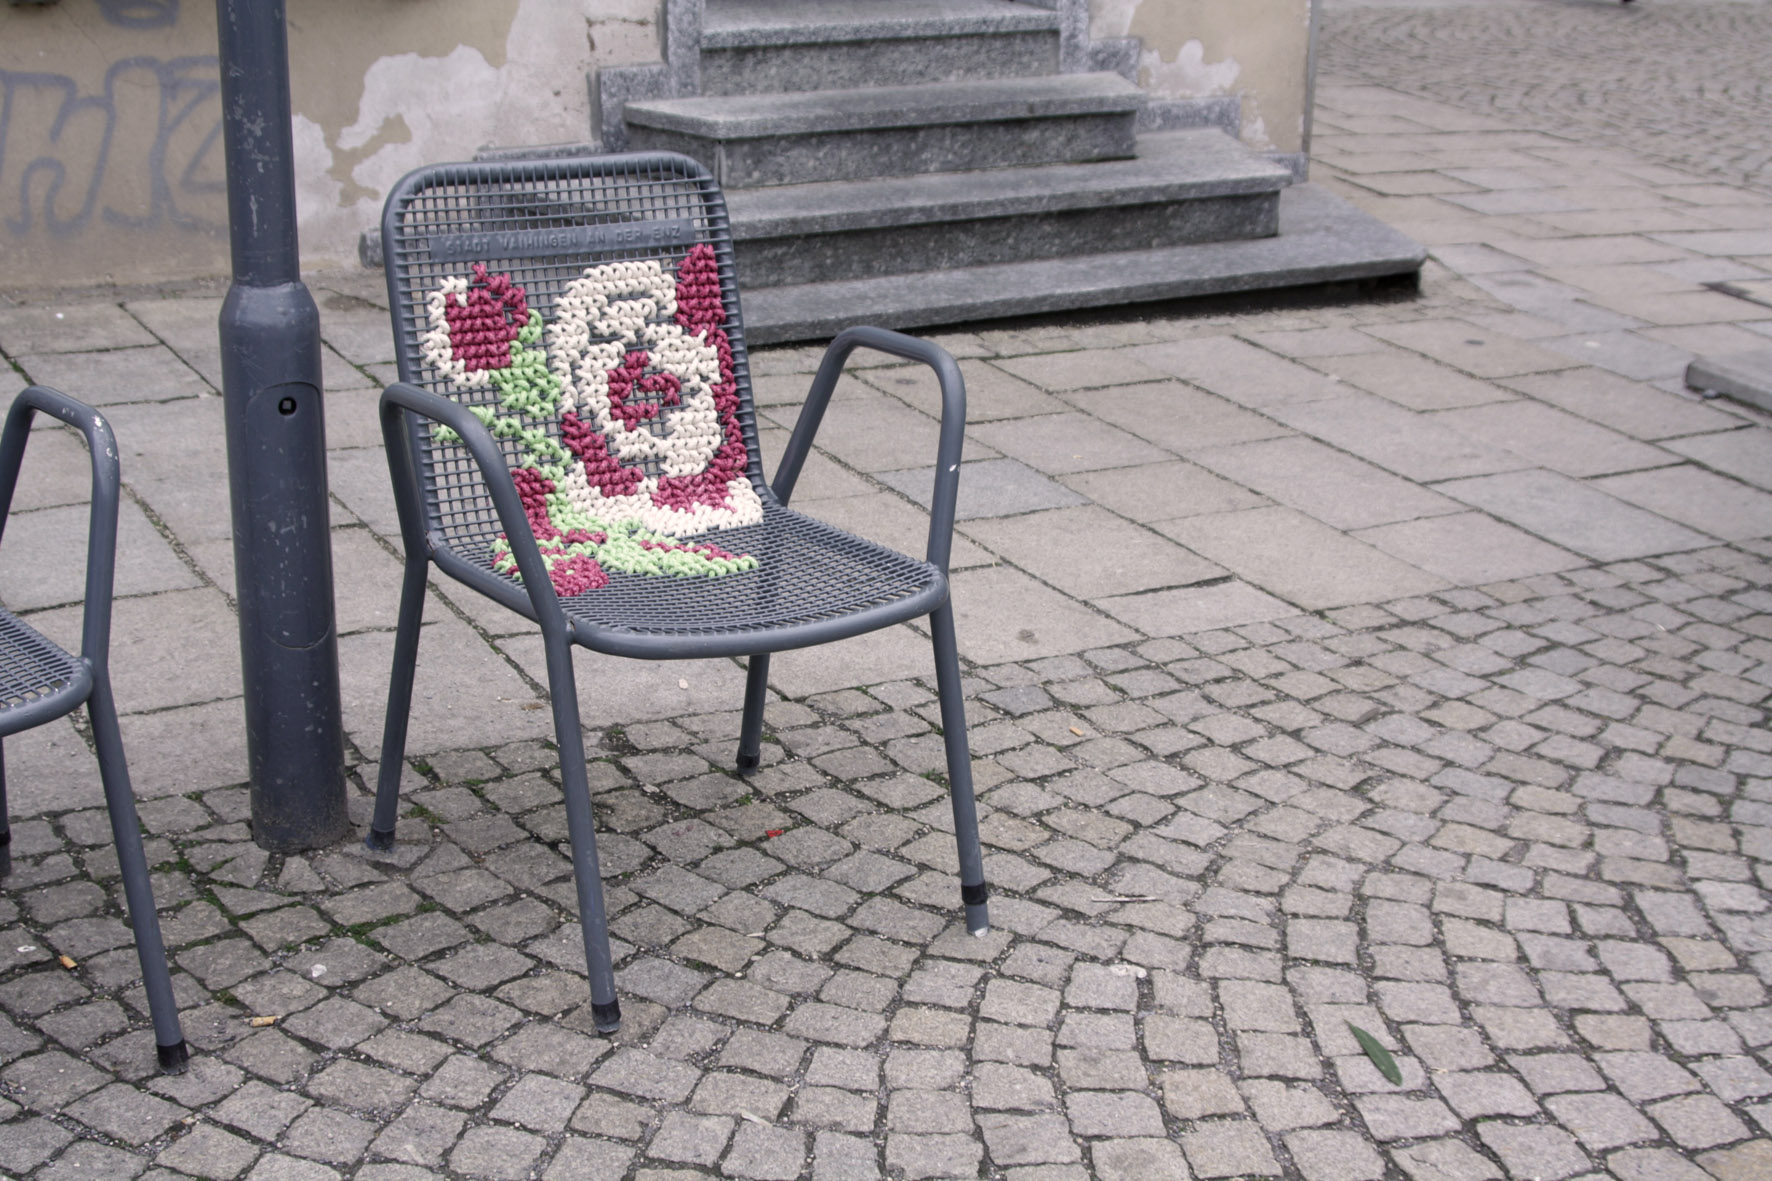 celik-metal-nakis-isleme-polipropilen-kamusal-yarn-bombing-koltuk